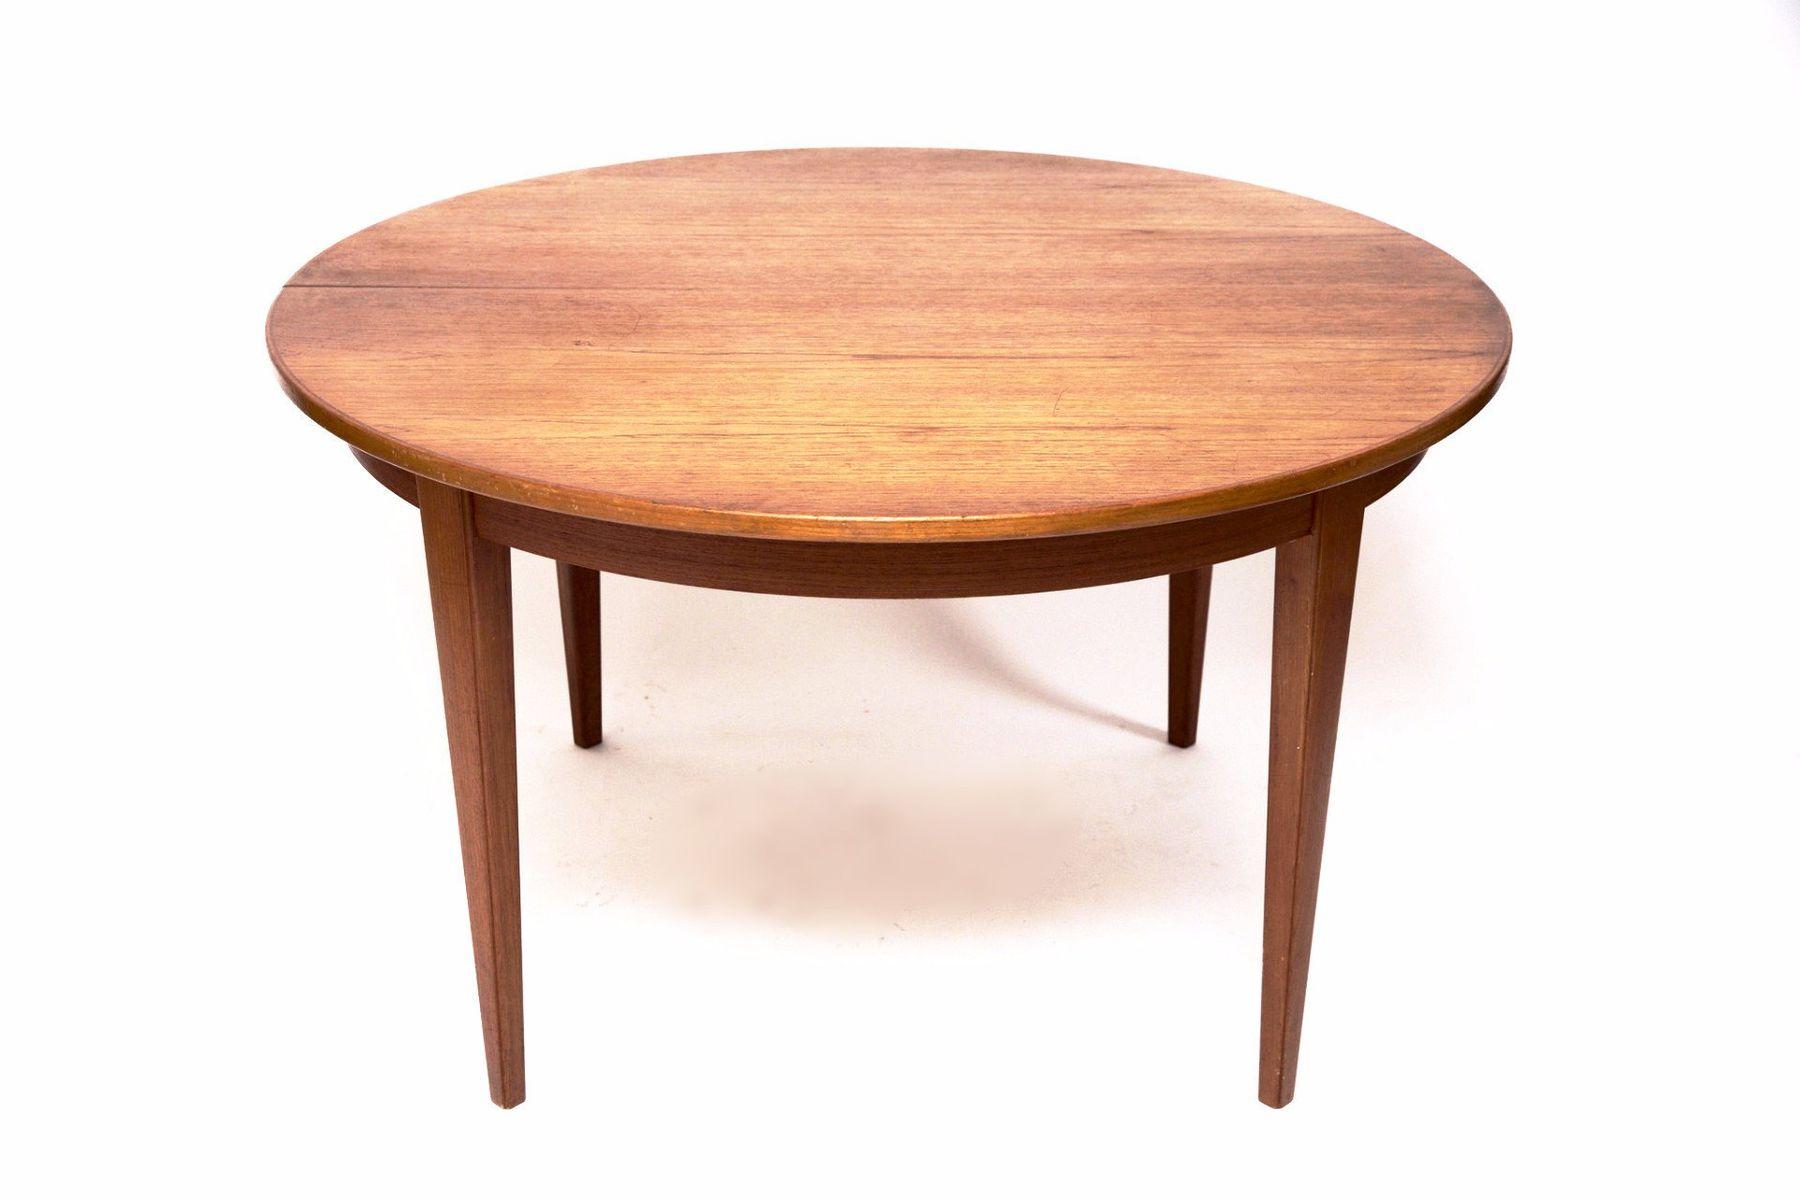 table de salon vintage en teck rallonge de omann jun m belfabrik danemark en vente sur pamono. Black Bedroom Furniture Sets. Home Design Ideas